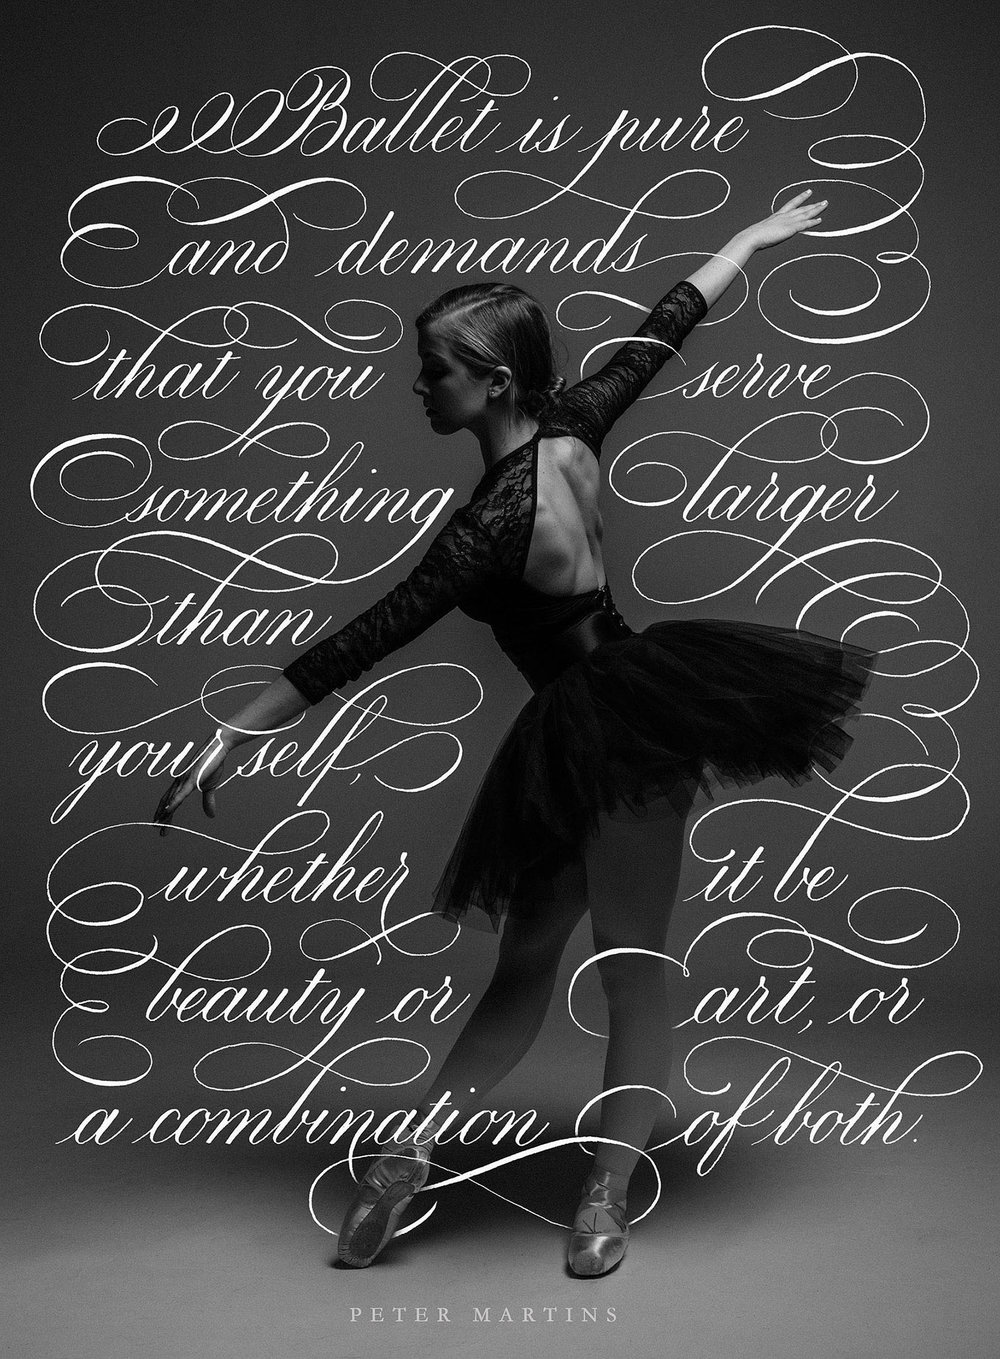 ballet_is_pure_calligraphy_typeandgraphicslab_photo_ron-sartini-web.jpg